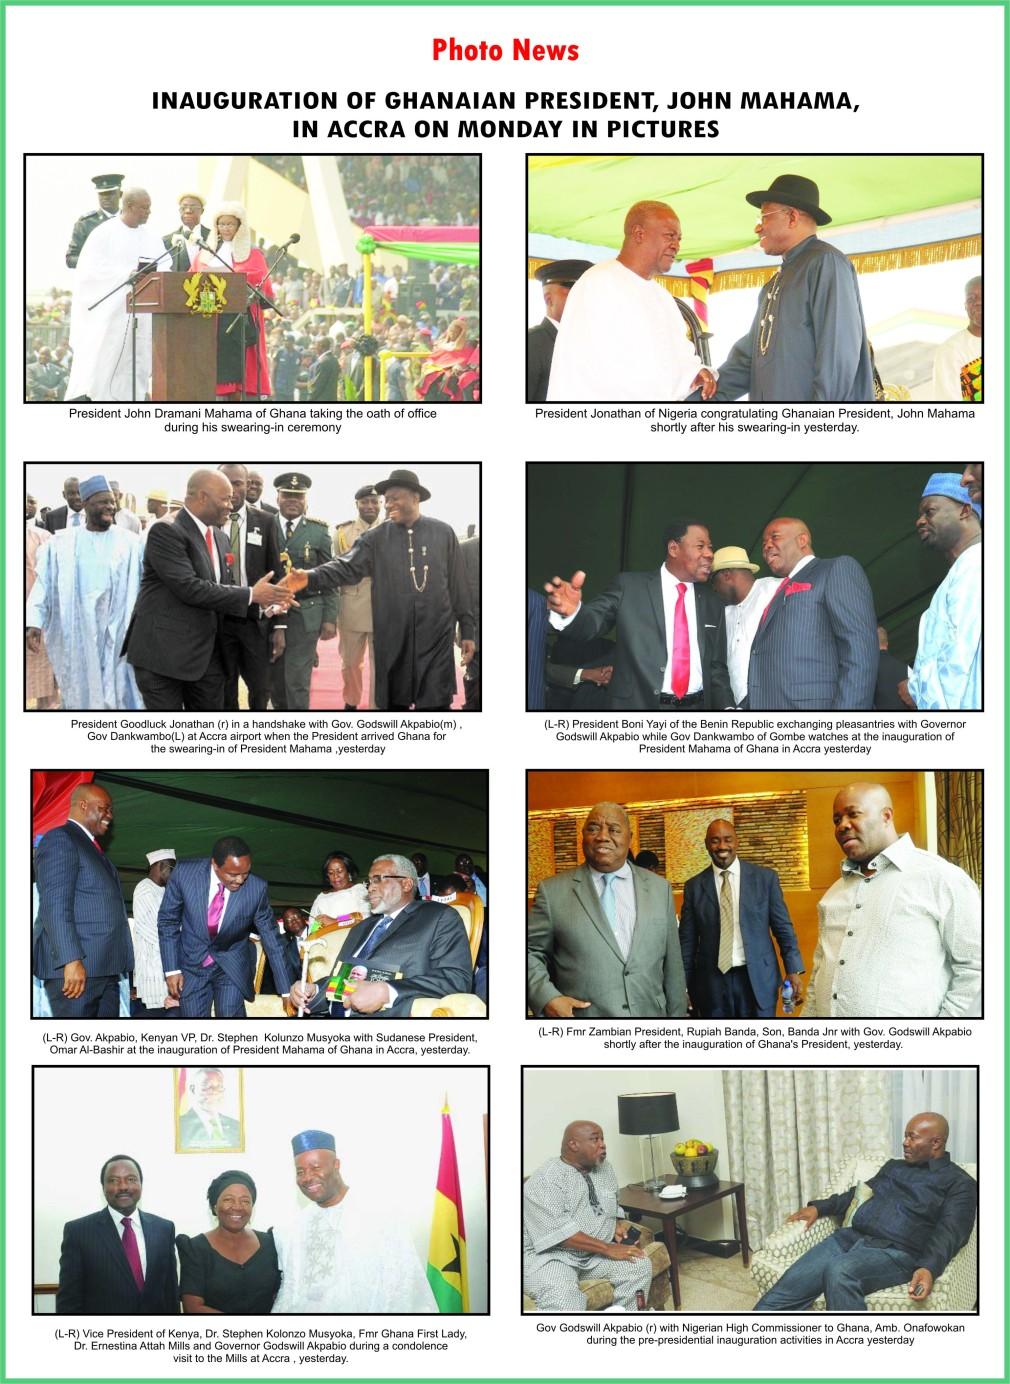 Inauguration of Ghana's President Maham